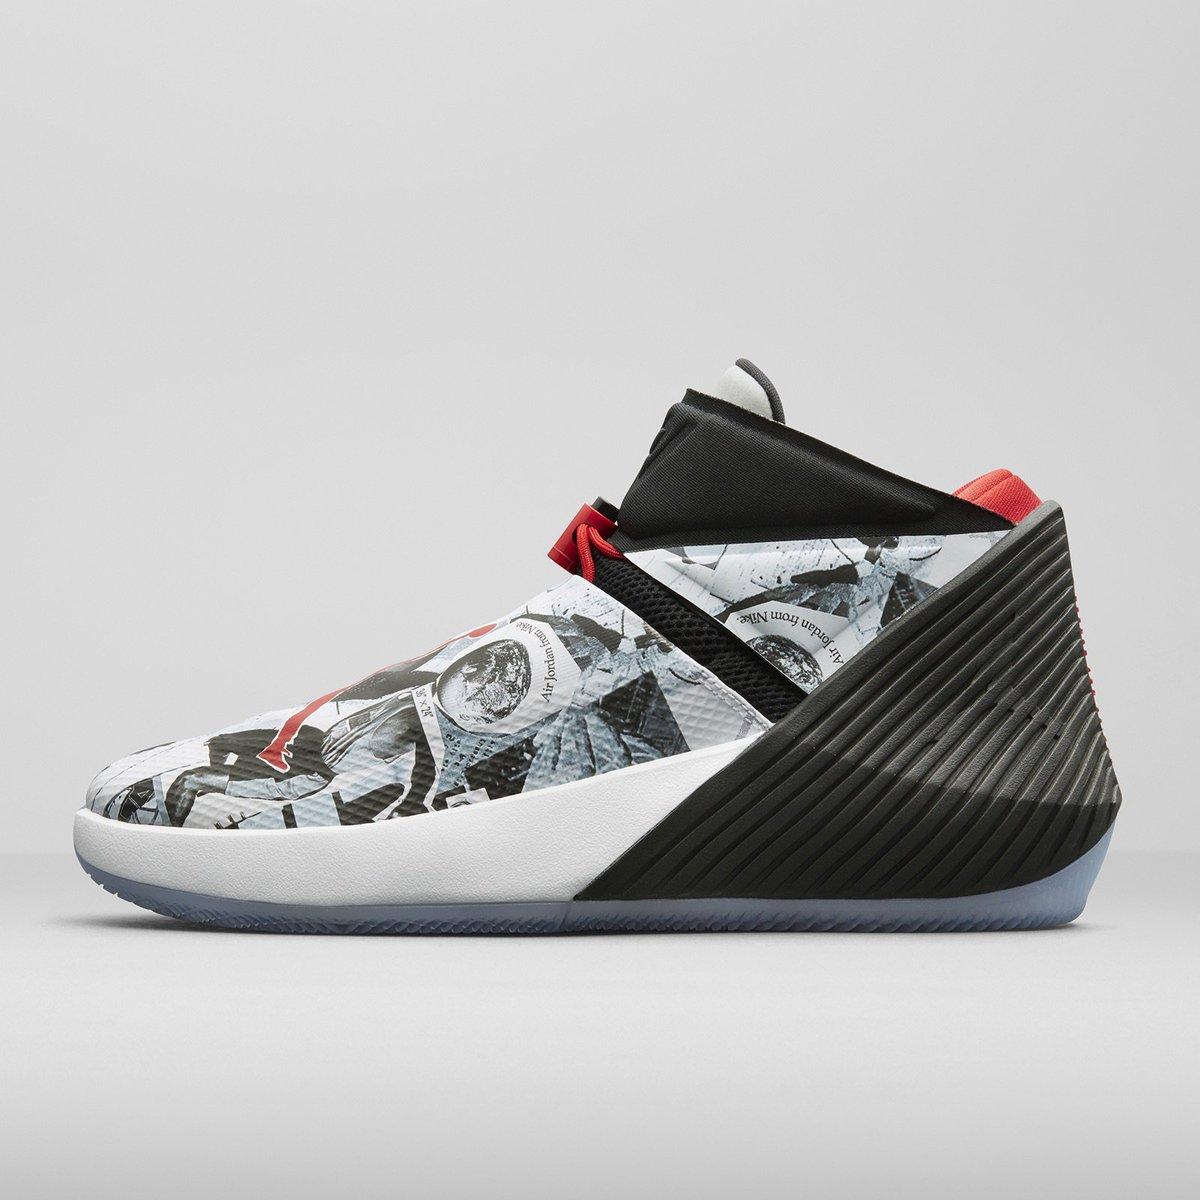 83ac7bec947985 New Westbrook signature shoe  (Pic)